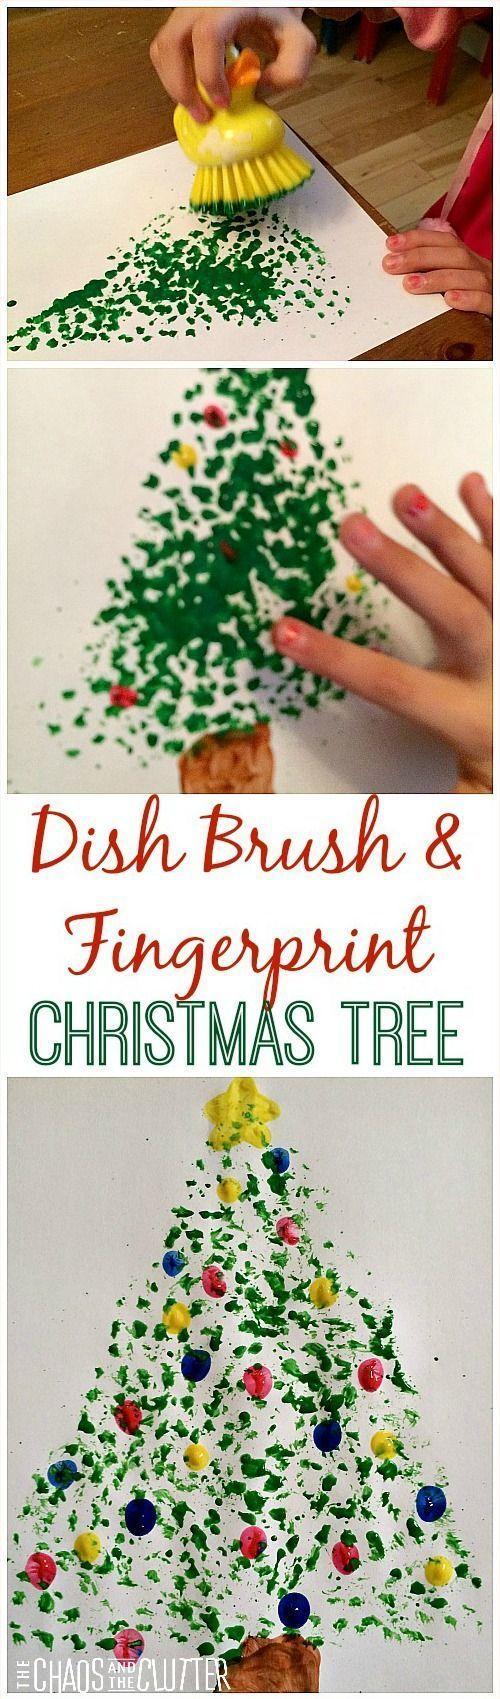 Dish Brush and Fingerprint Painted Christmas Tree - so cute!                                                                                                                                                                                 More